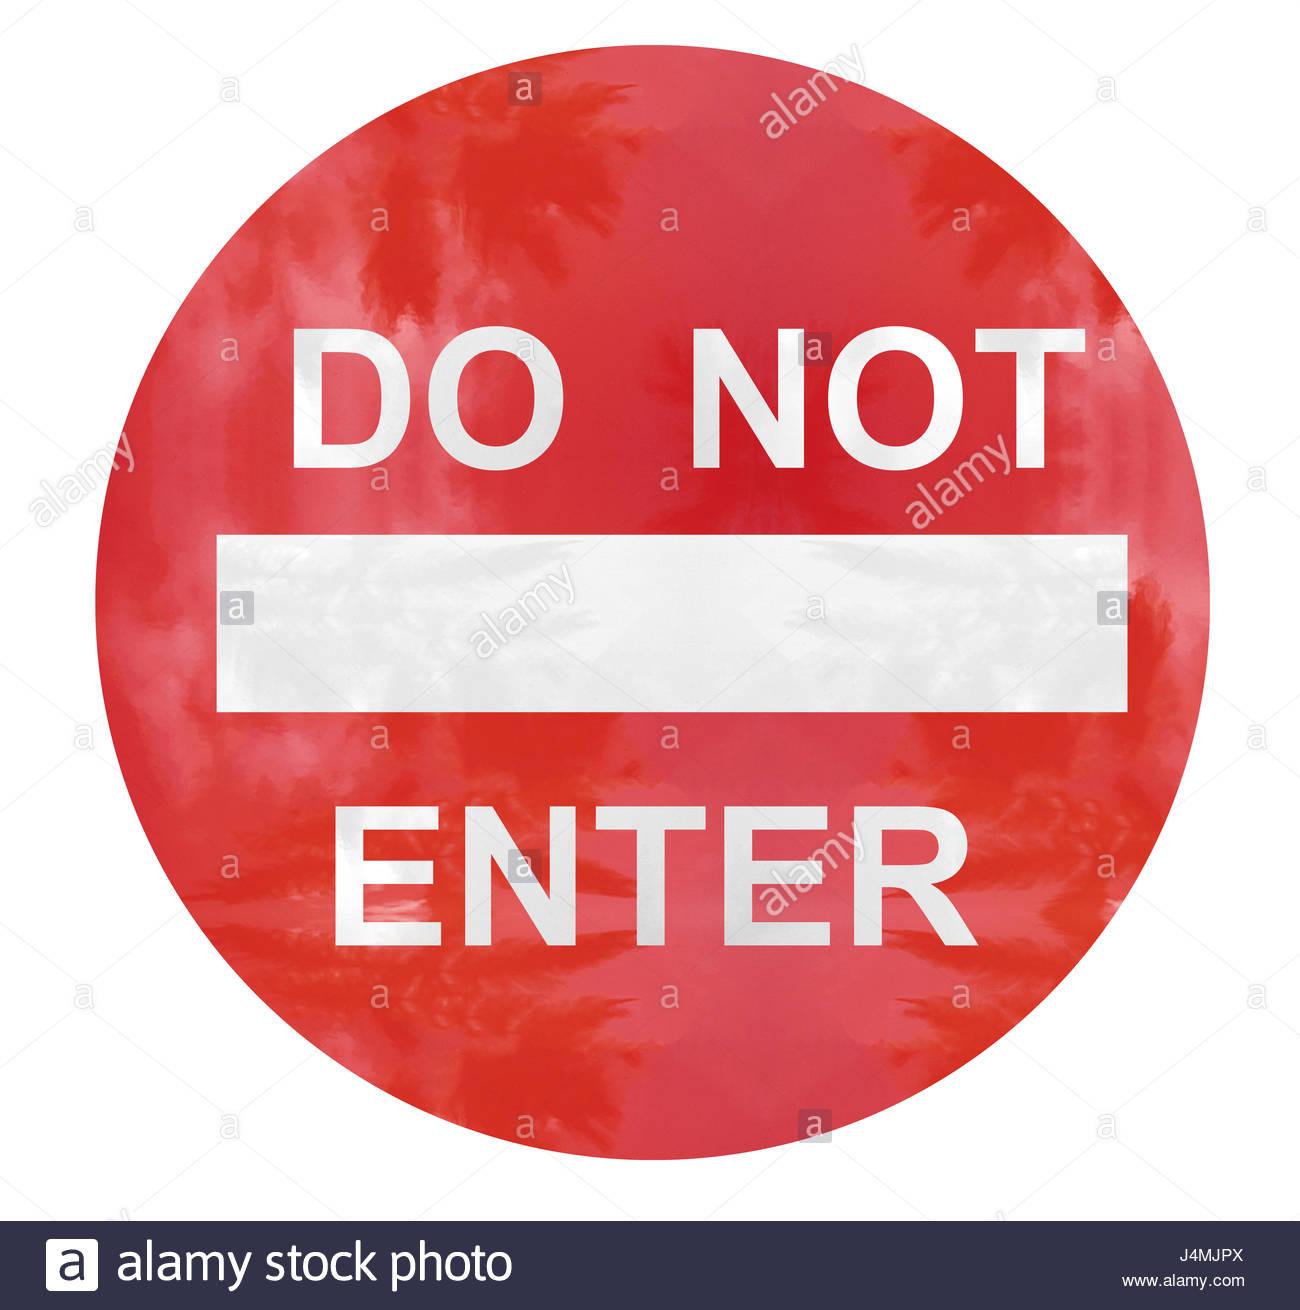 do not enter caution sign illustration - Stock Image